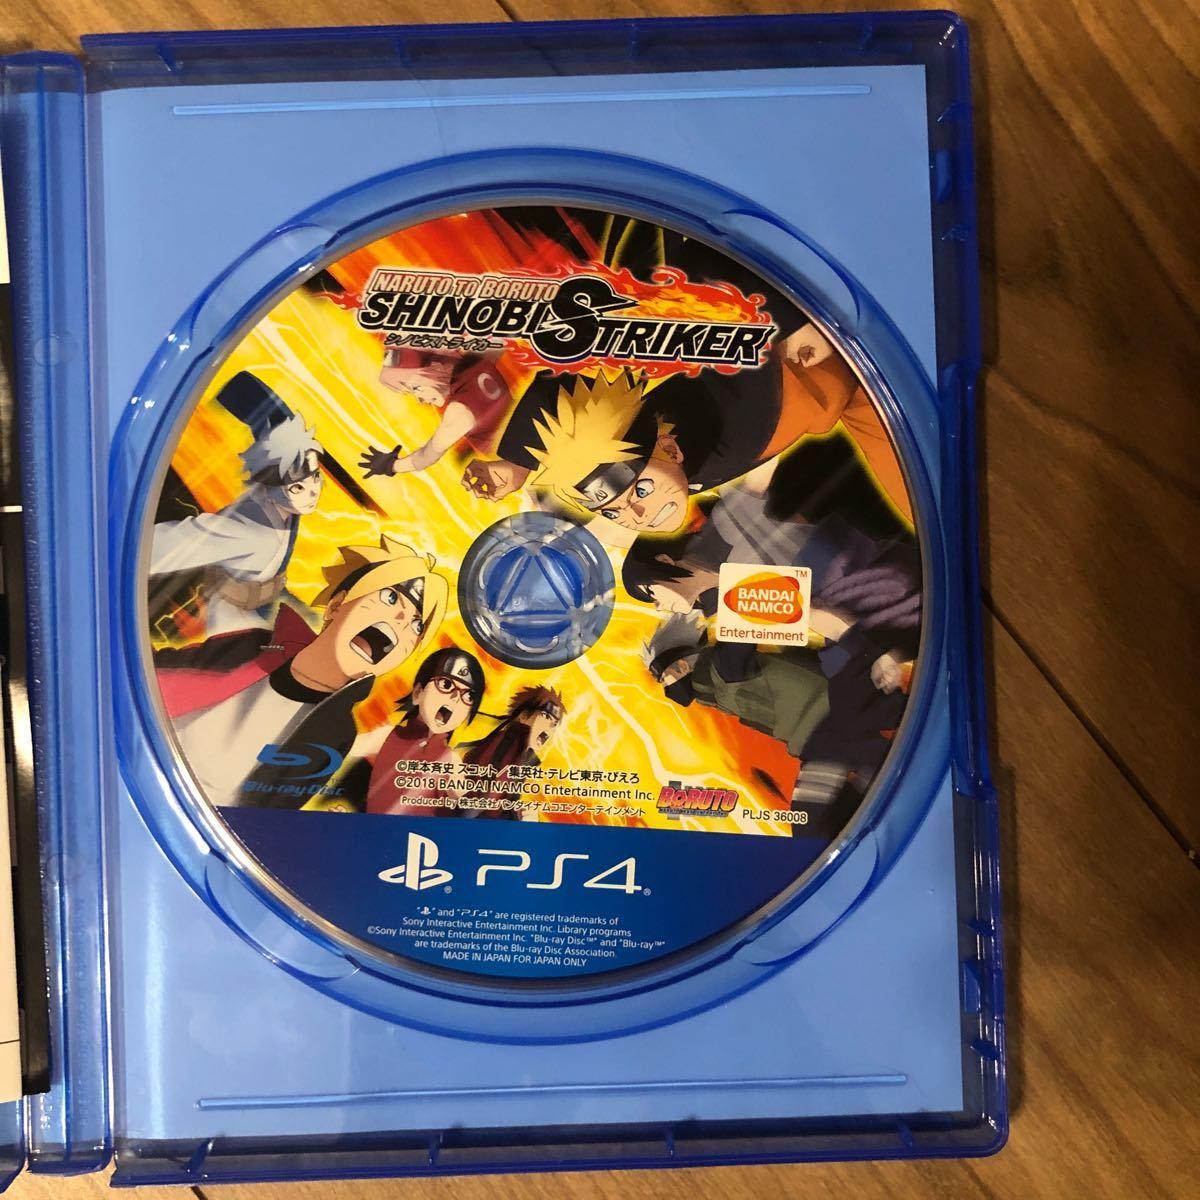 PS4 NARUTO シノビストライカー